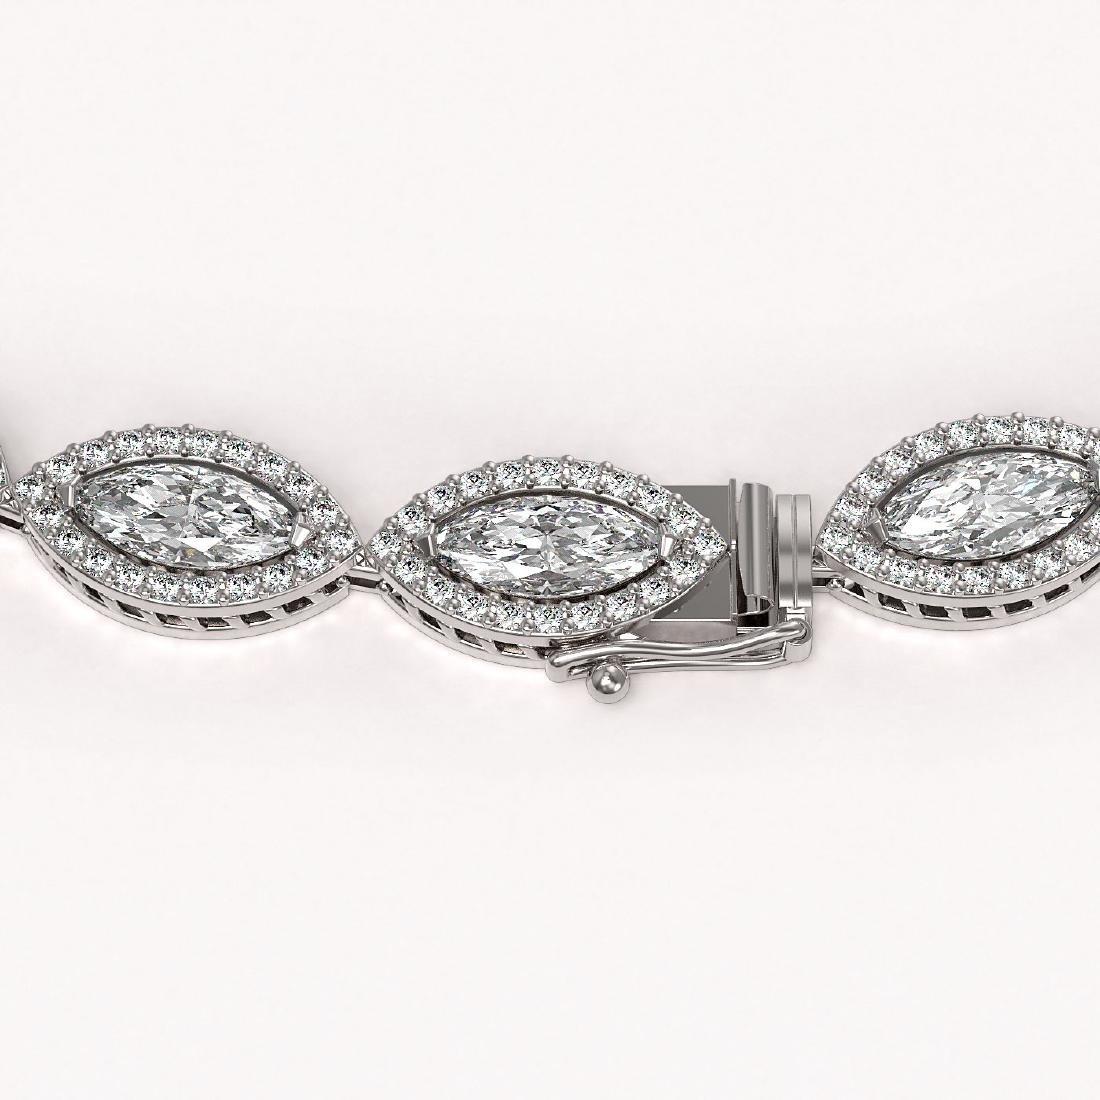 24.42 CTW Marquise Diamond Designer Necklace 18K White - 2